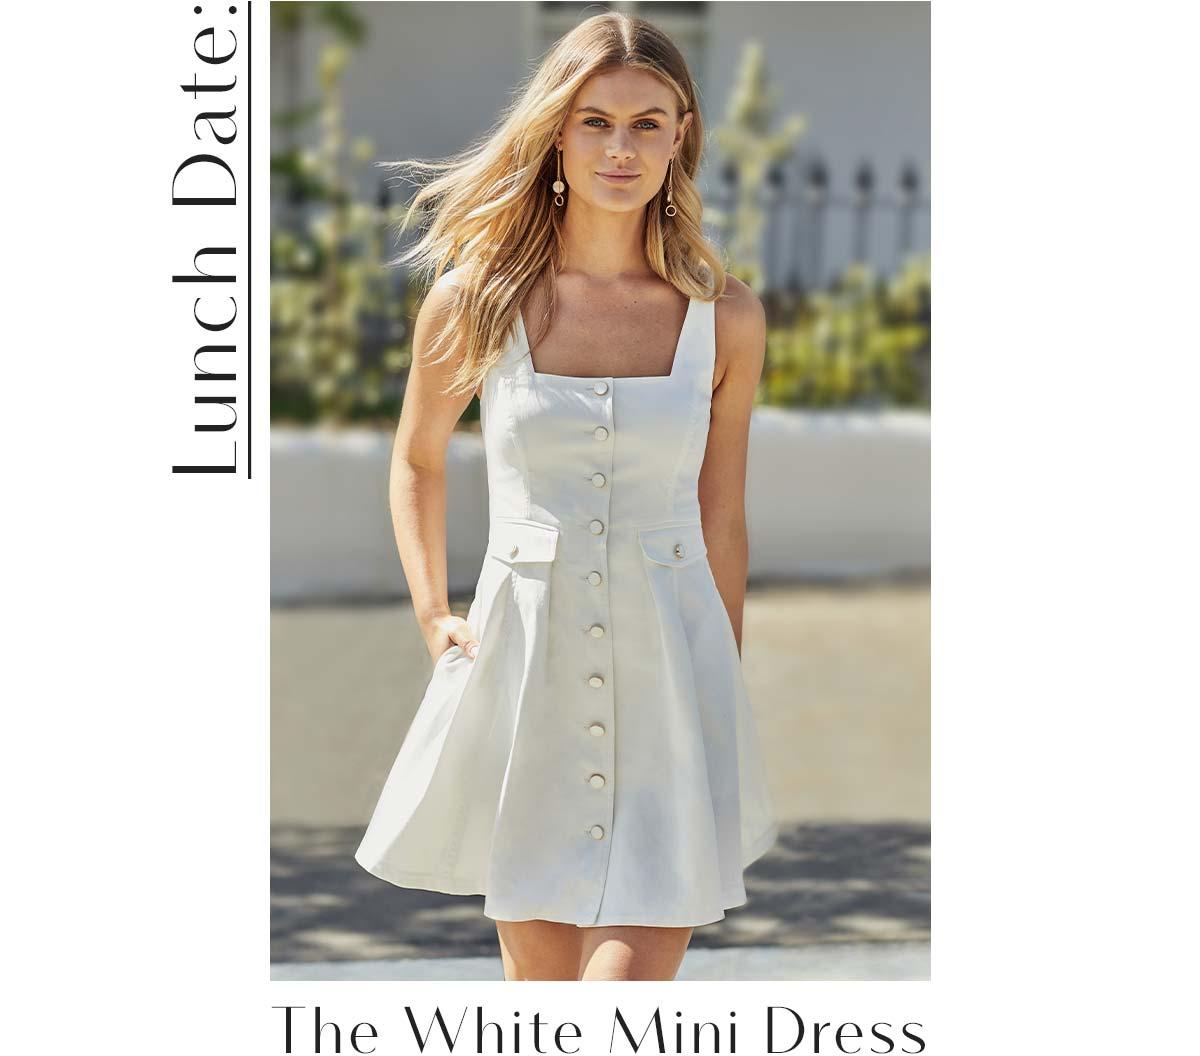 Lunch Date: The White Mini Dress